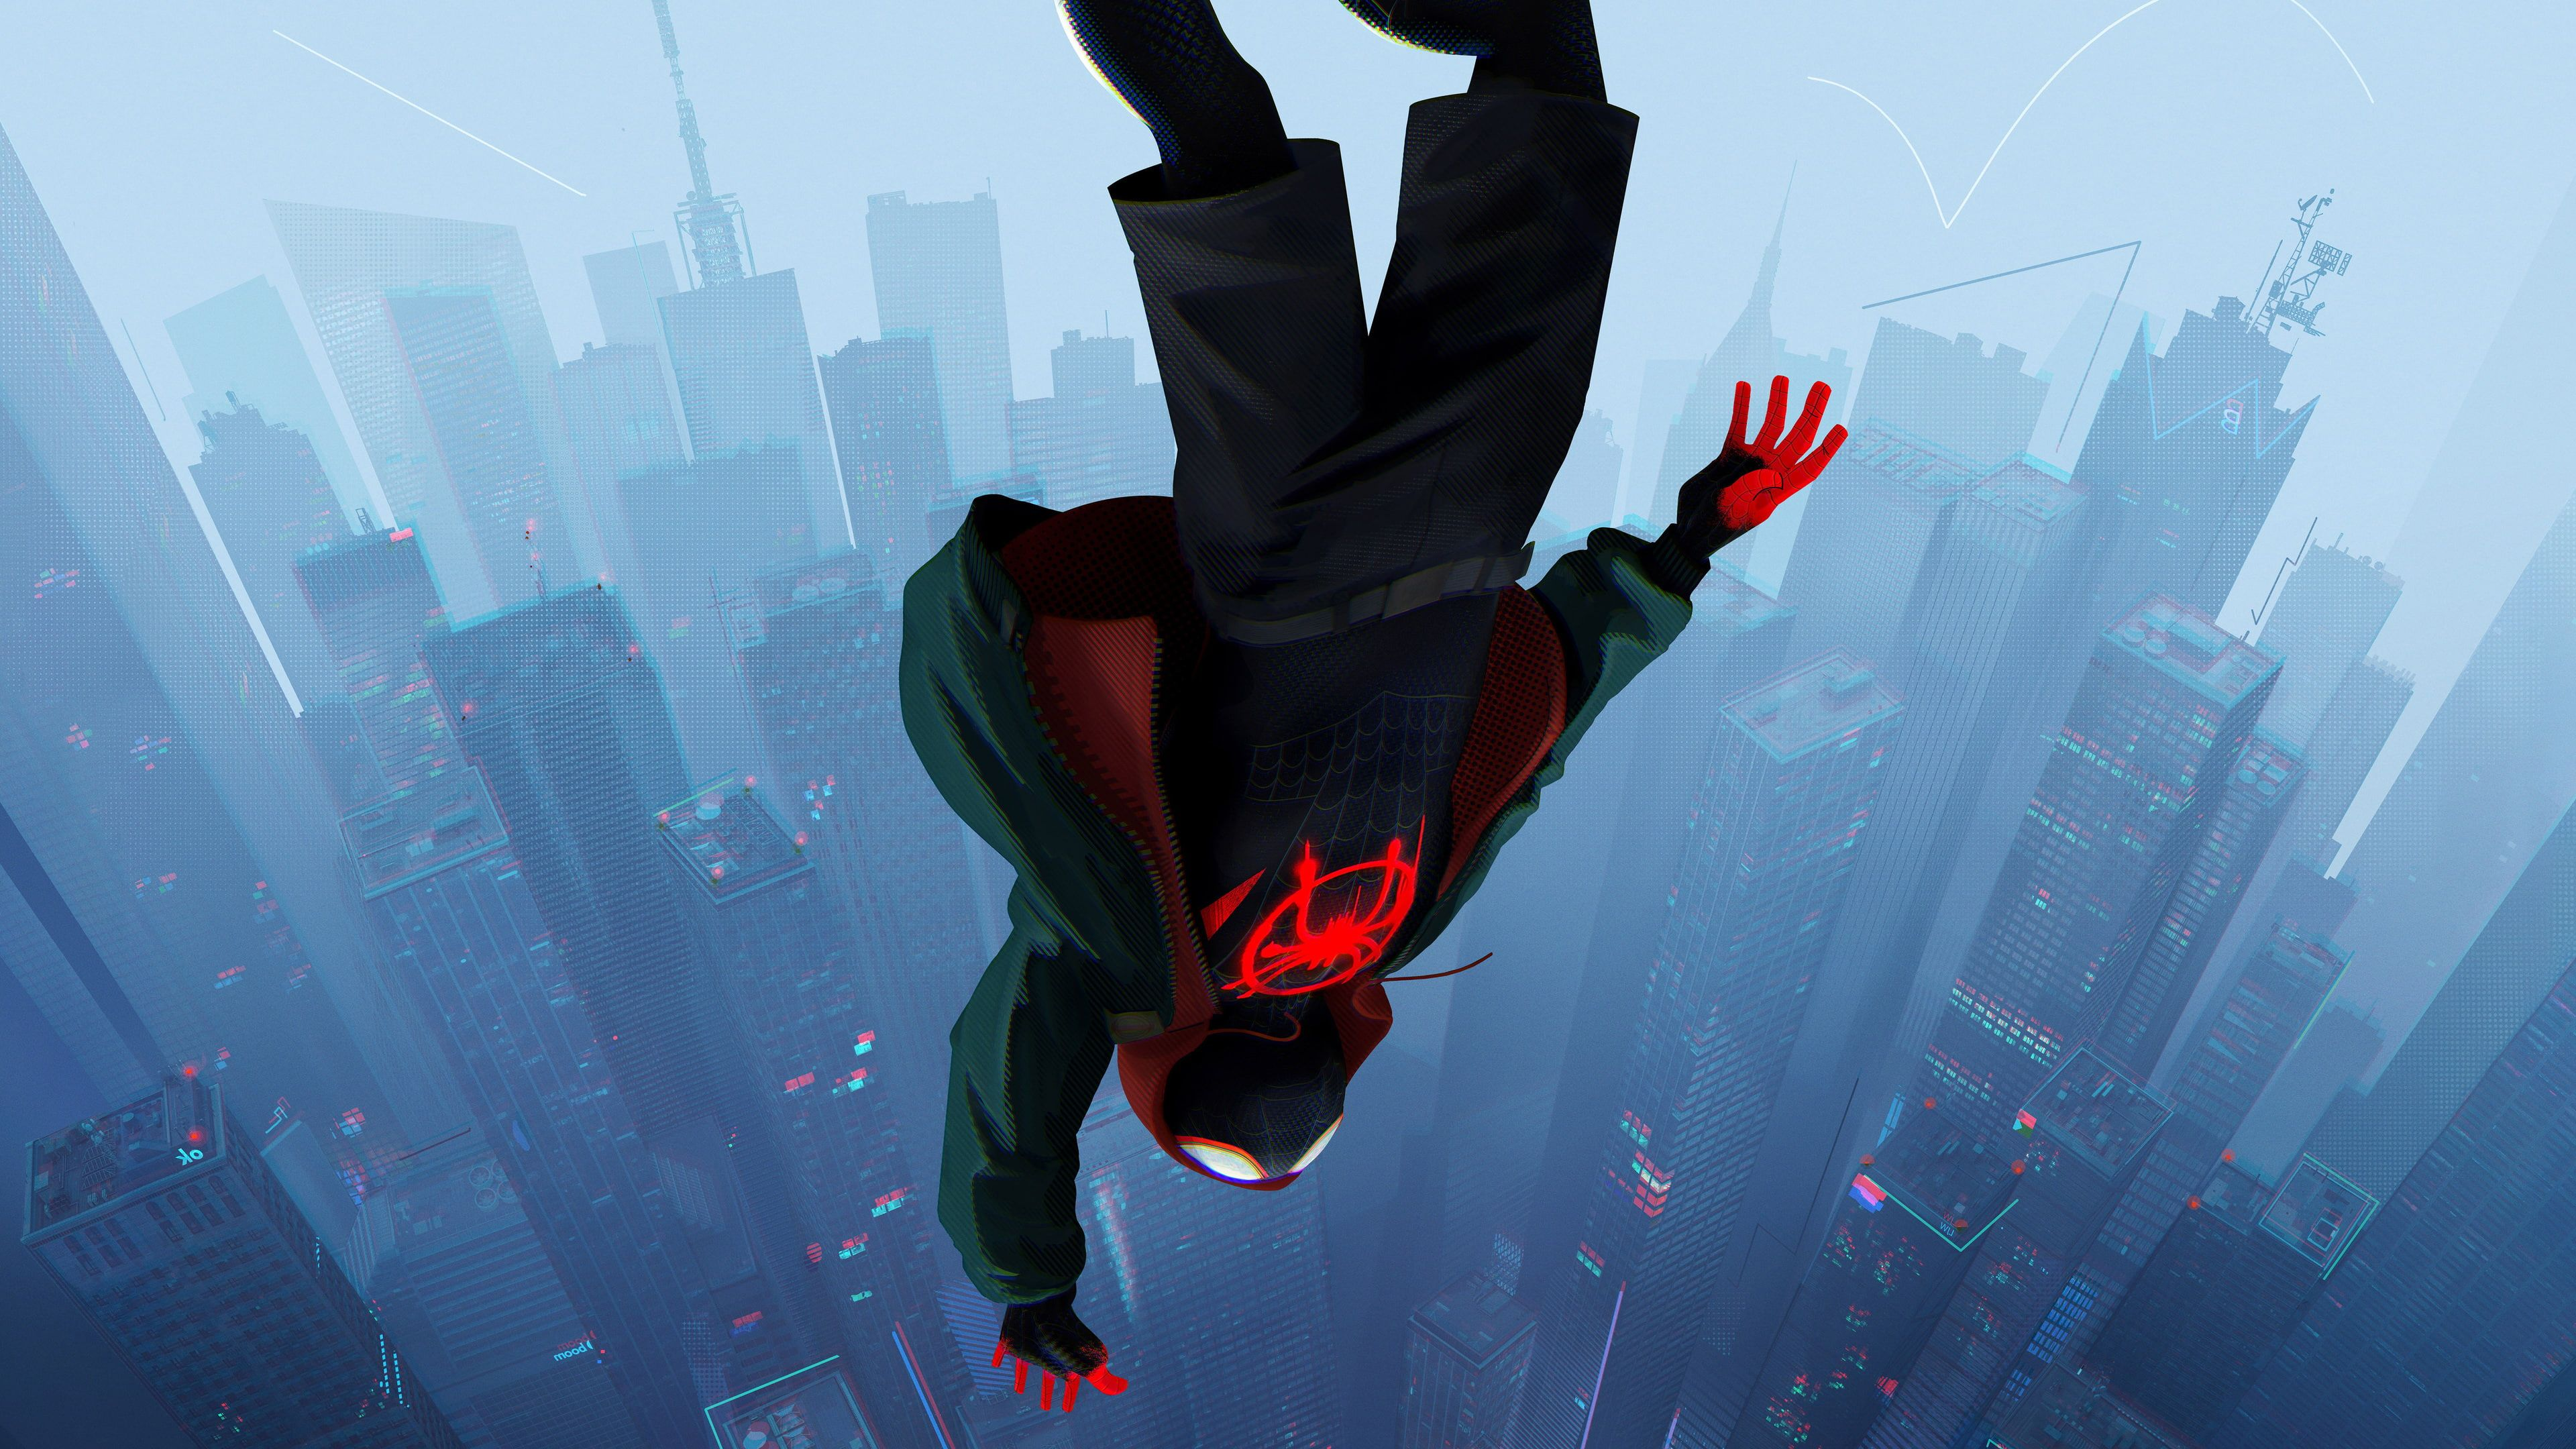 Into the Spider-Verse wallpaper, Spider-Man, Miles Morales, Marvel Comics • Wallpaper For You HD Wallpaper For Desktop & Mobile